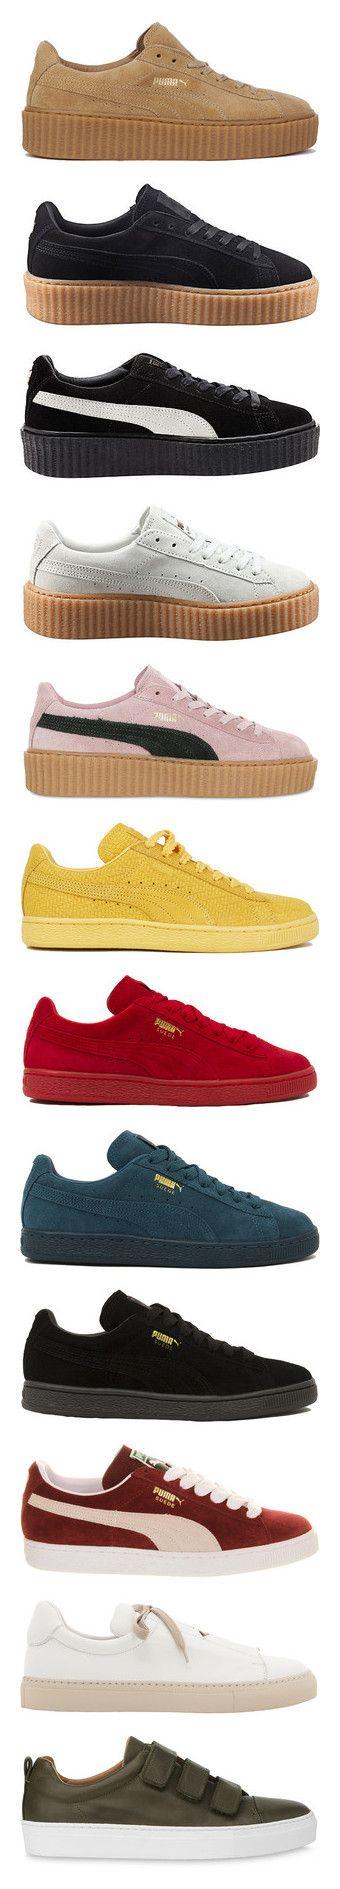 Chaussures || Puma